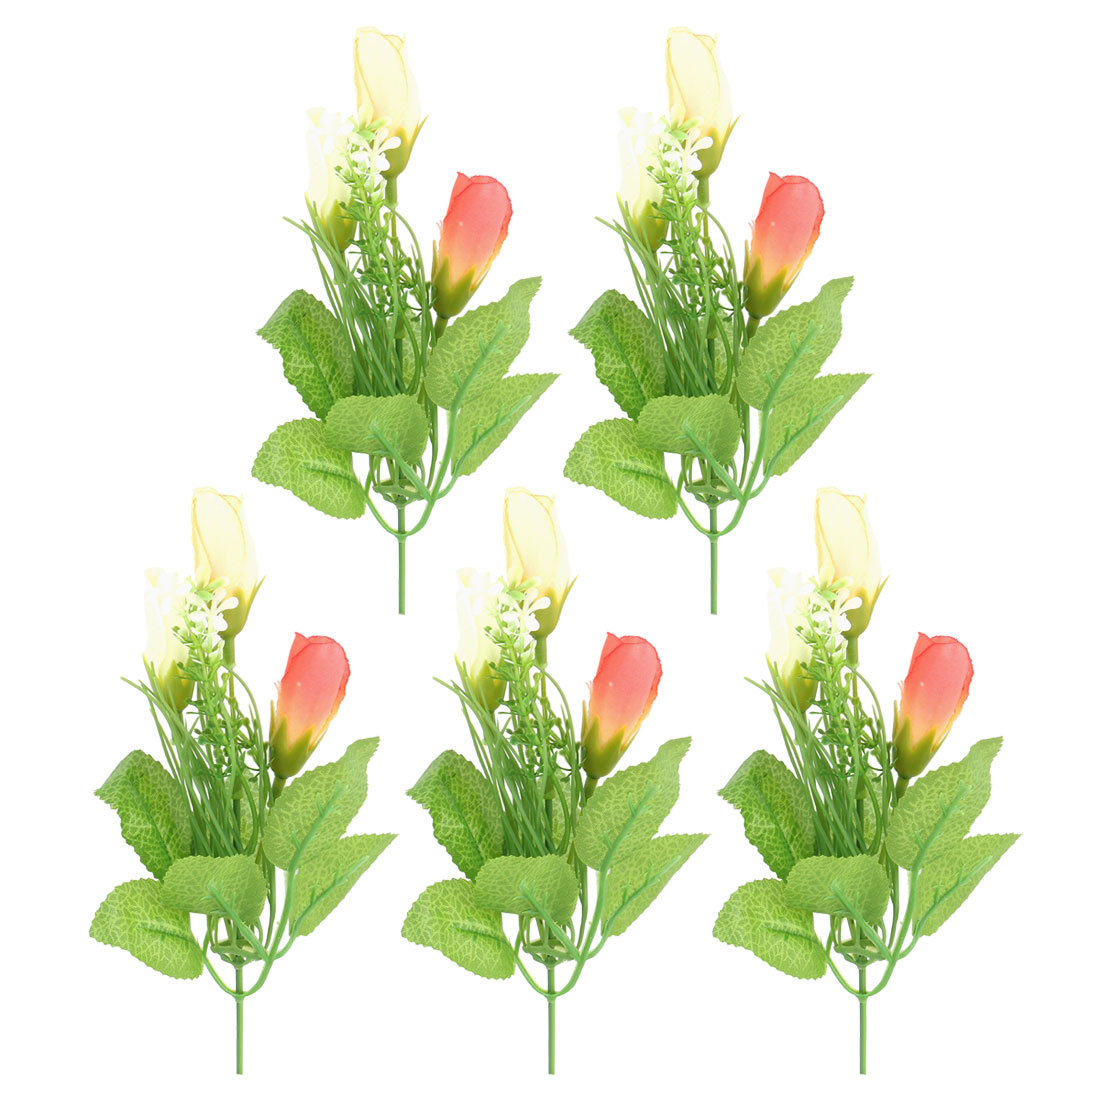 Wedding Party Fabric Tulips Buds Artificial Emulational Flower Blossom Light Orange 5pcs